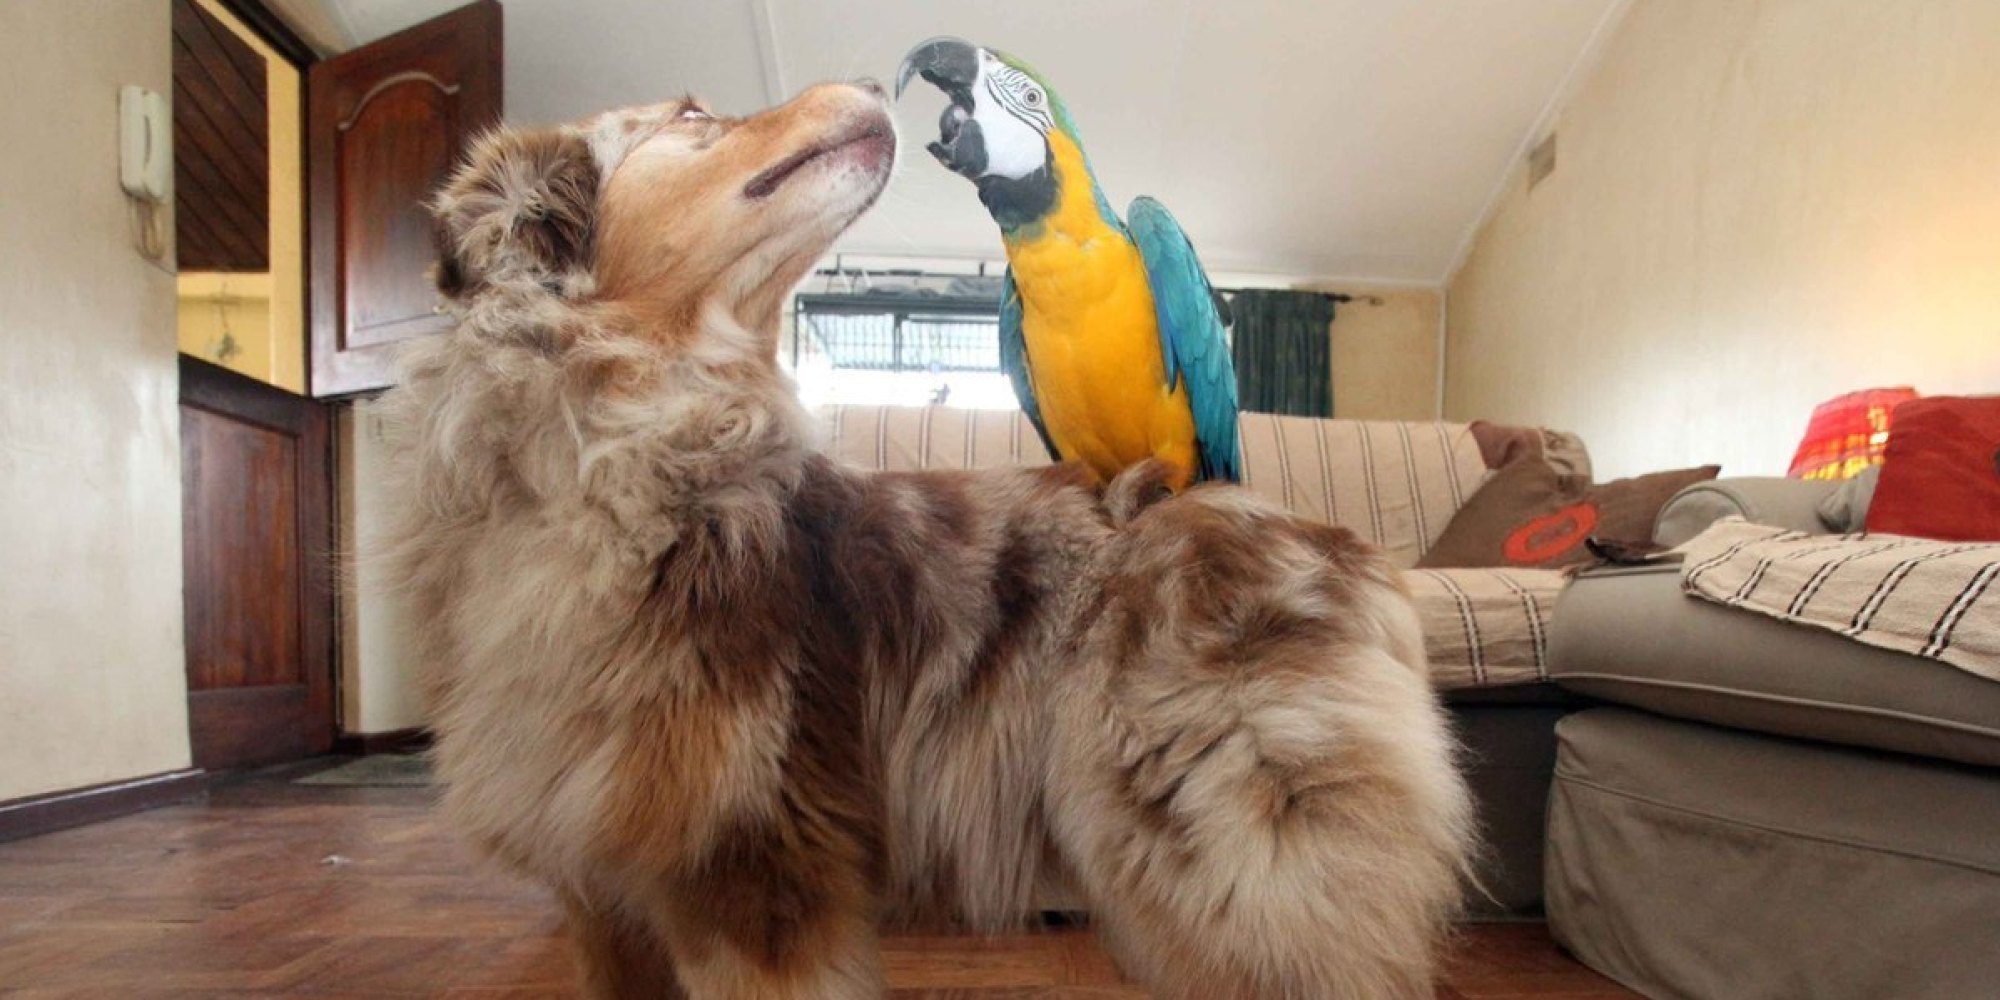 o-ANIMAL-FRIENDS-DOG-PARROT-facebook